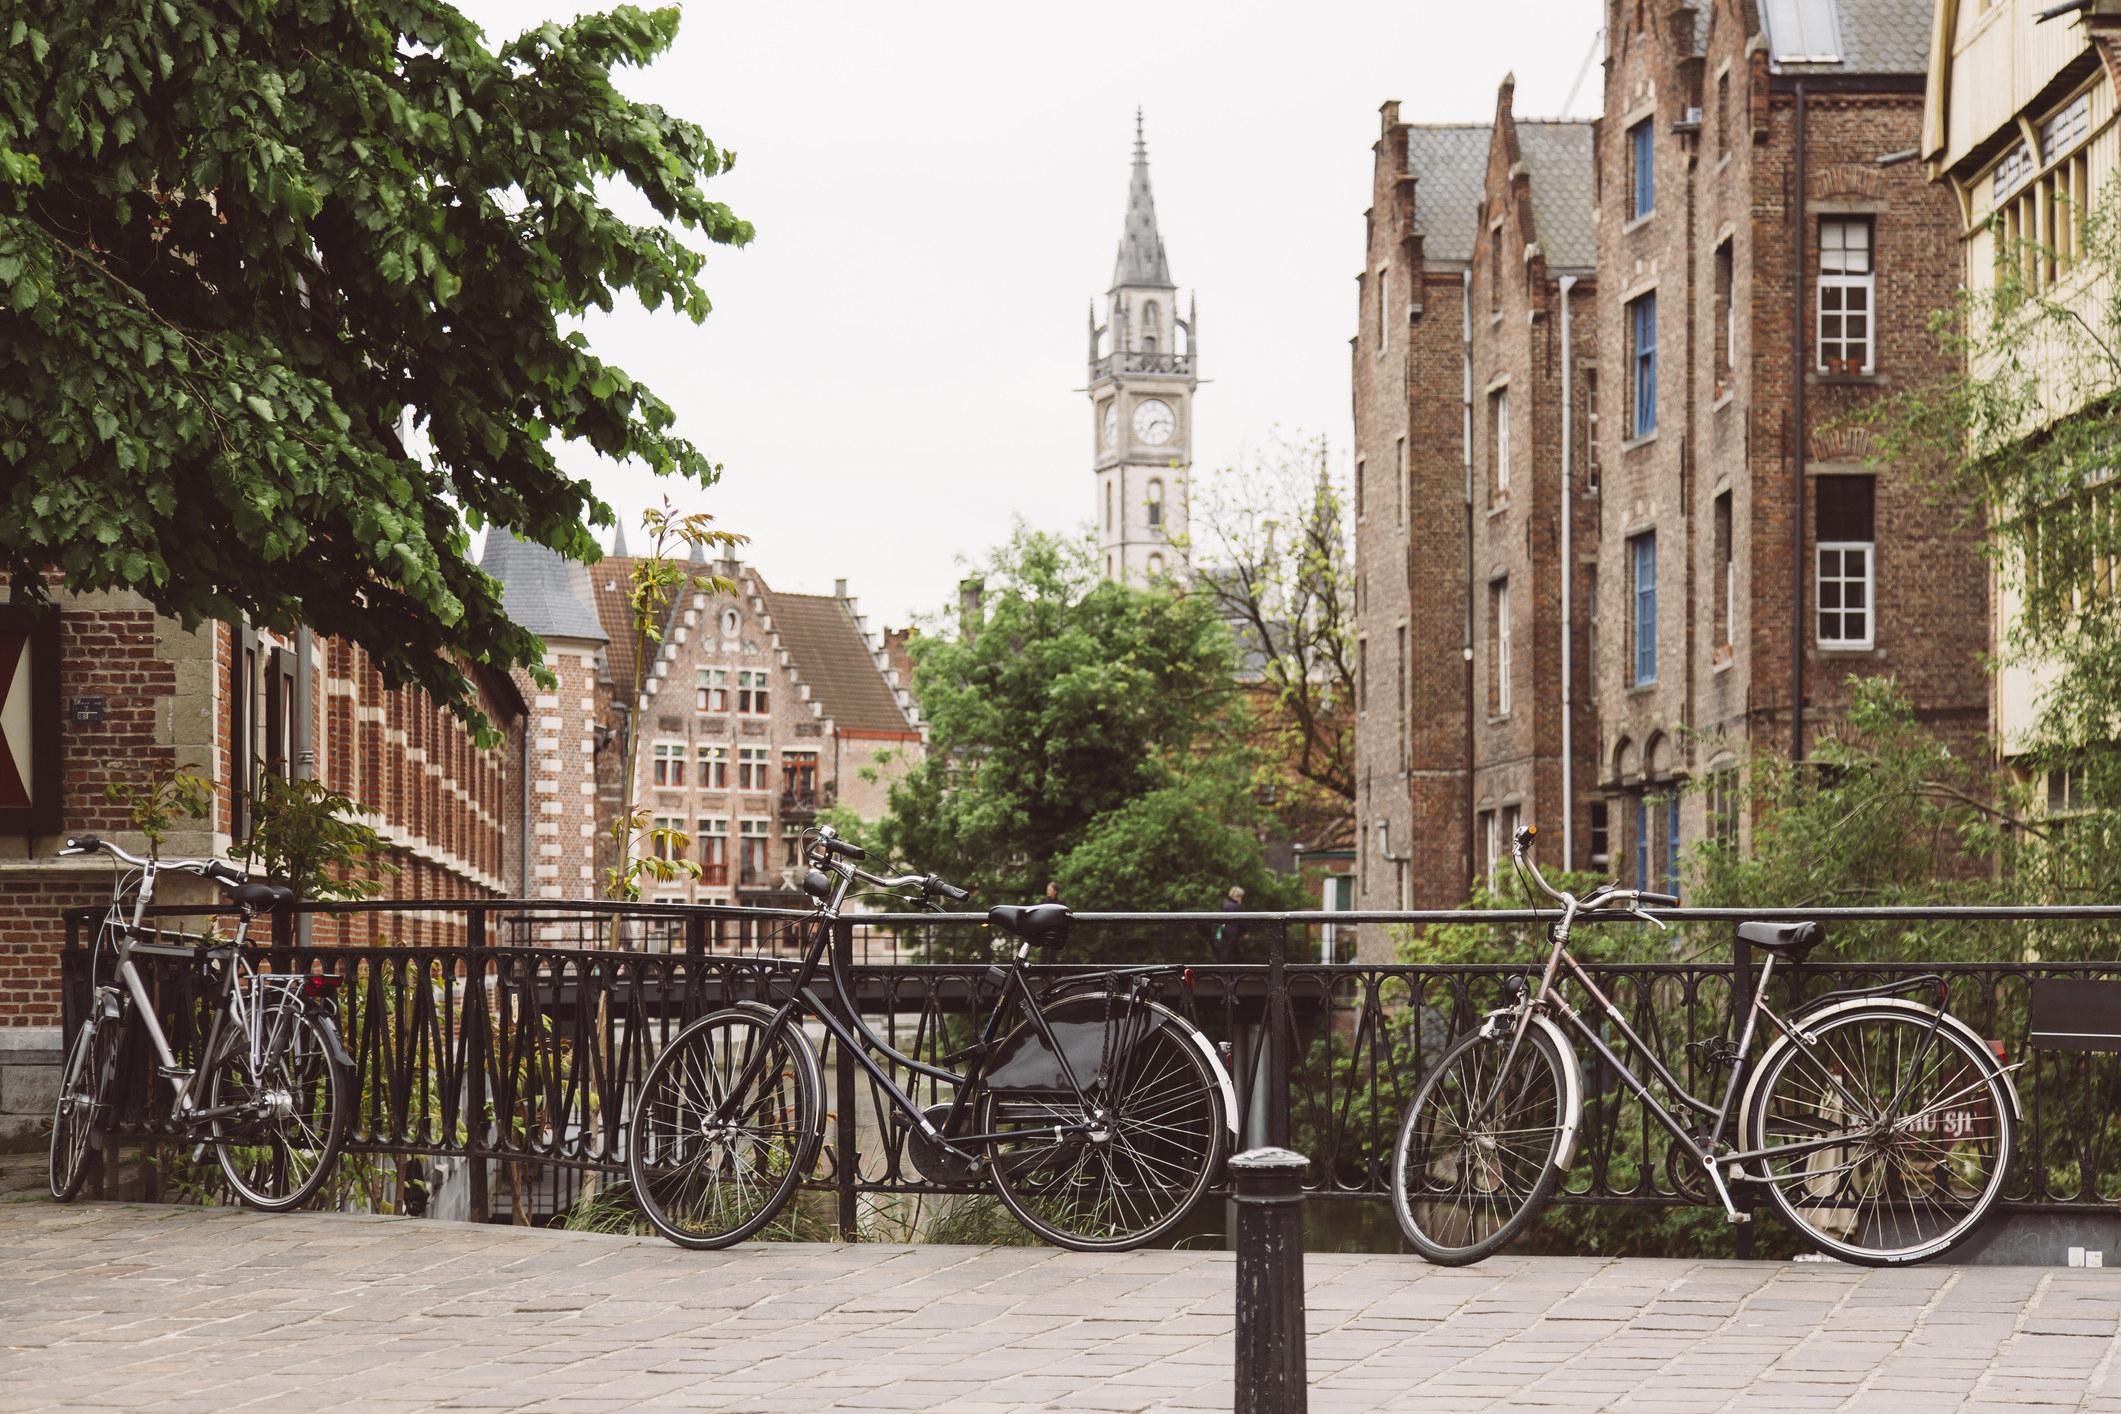 Bikes near a canal in Ghent, Belgium.